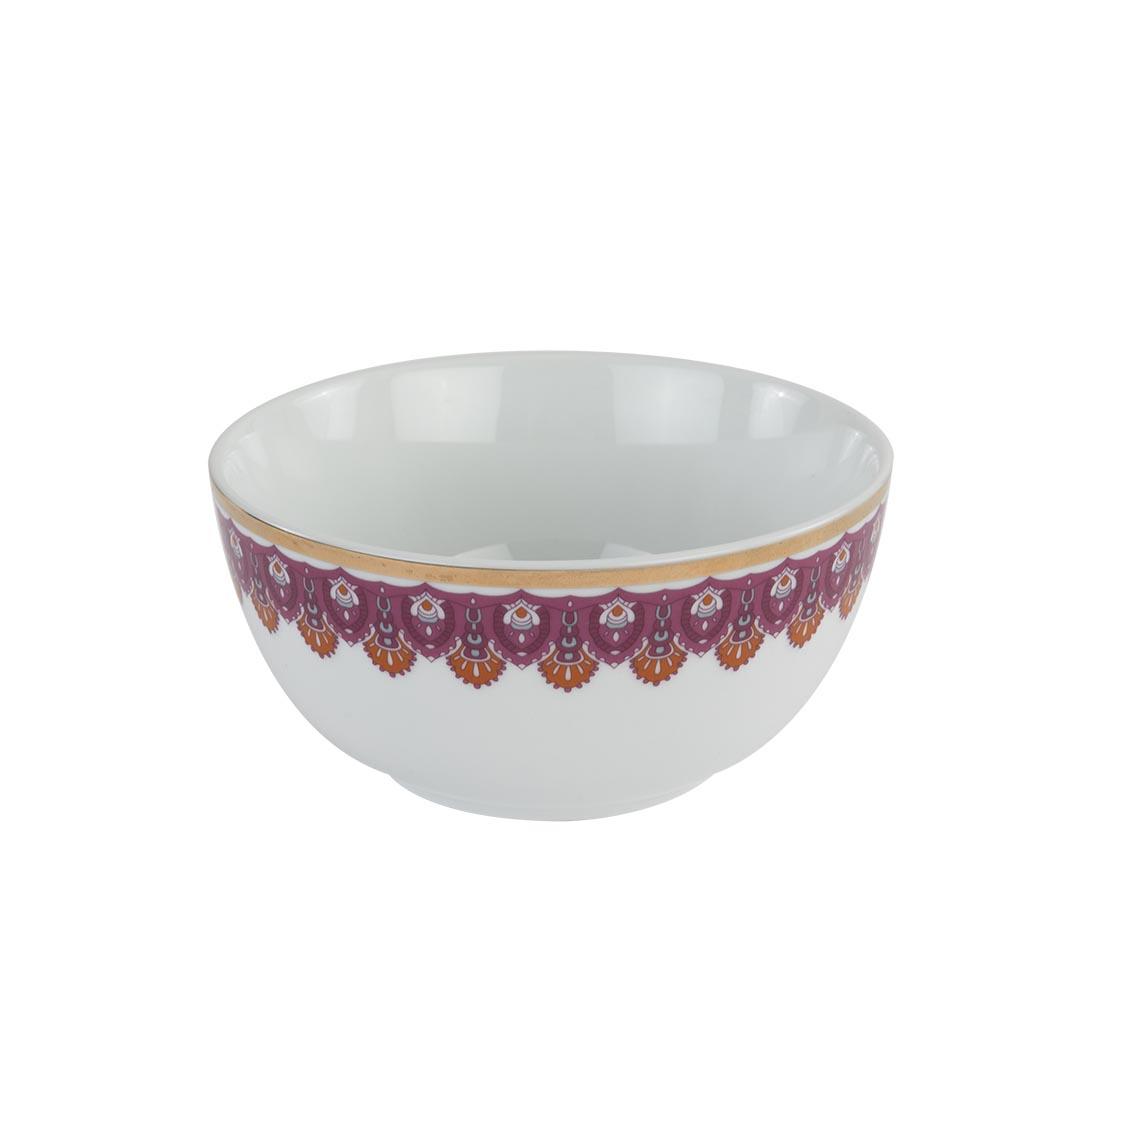 Gypsy Porselen Çorba Kasesi Pembe 6'lı (14 cm)